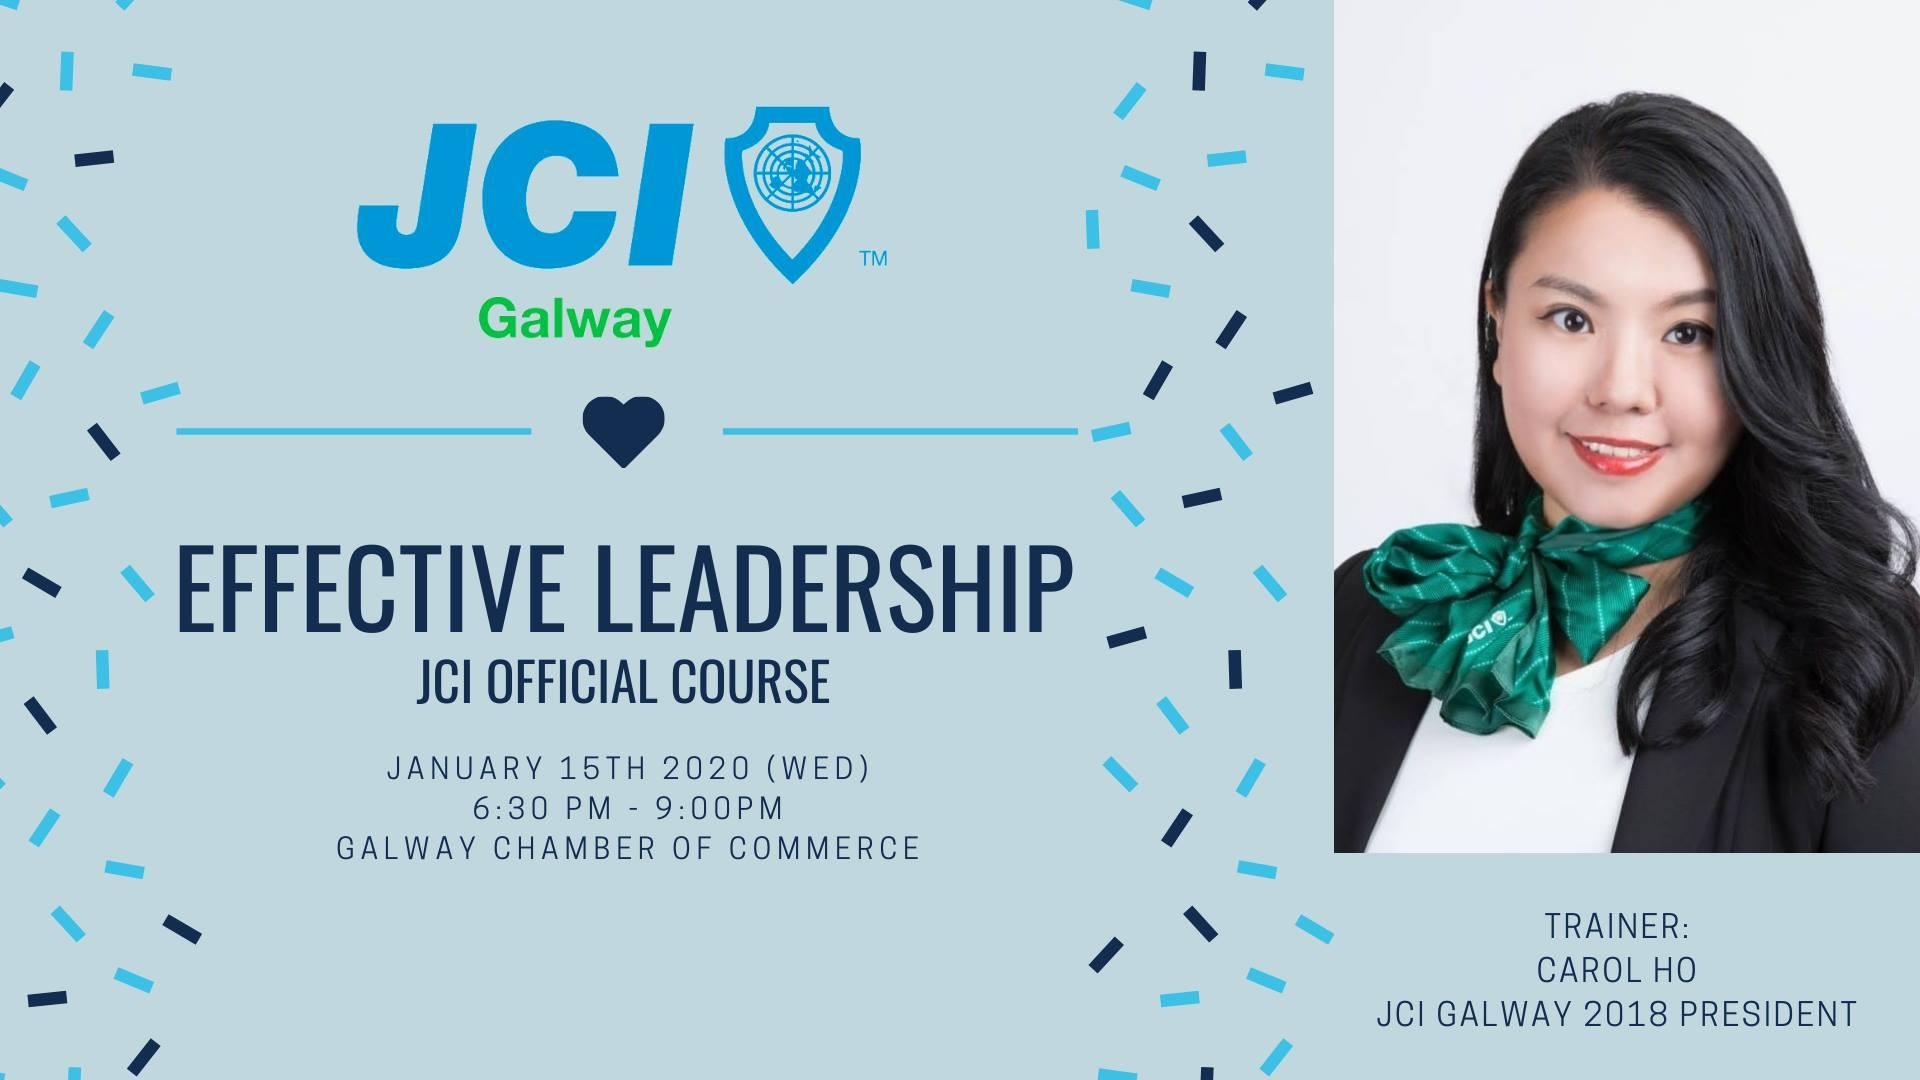 JCI Official Course - Effective Leadership